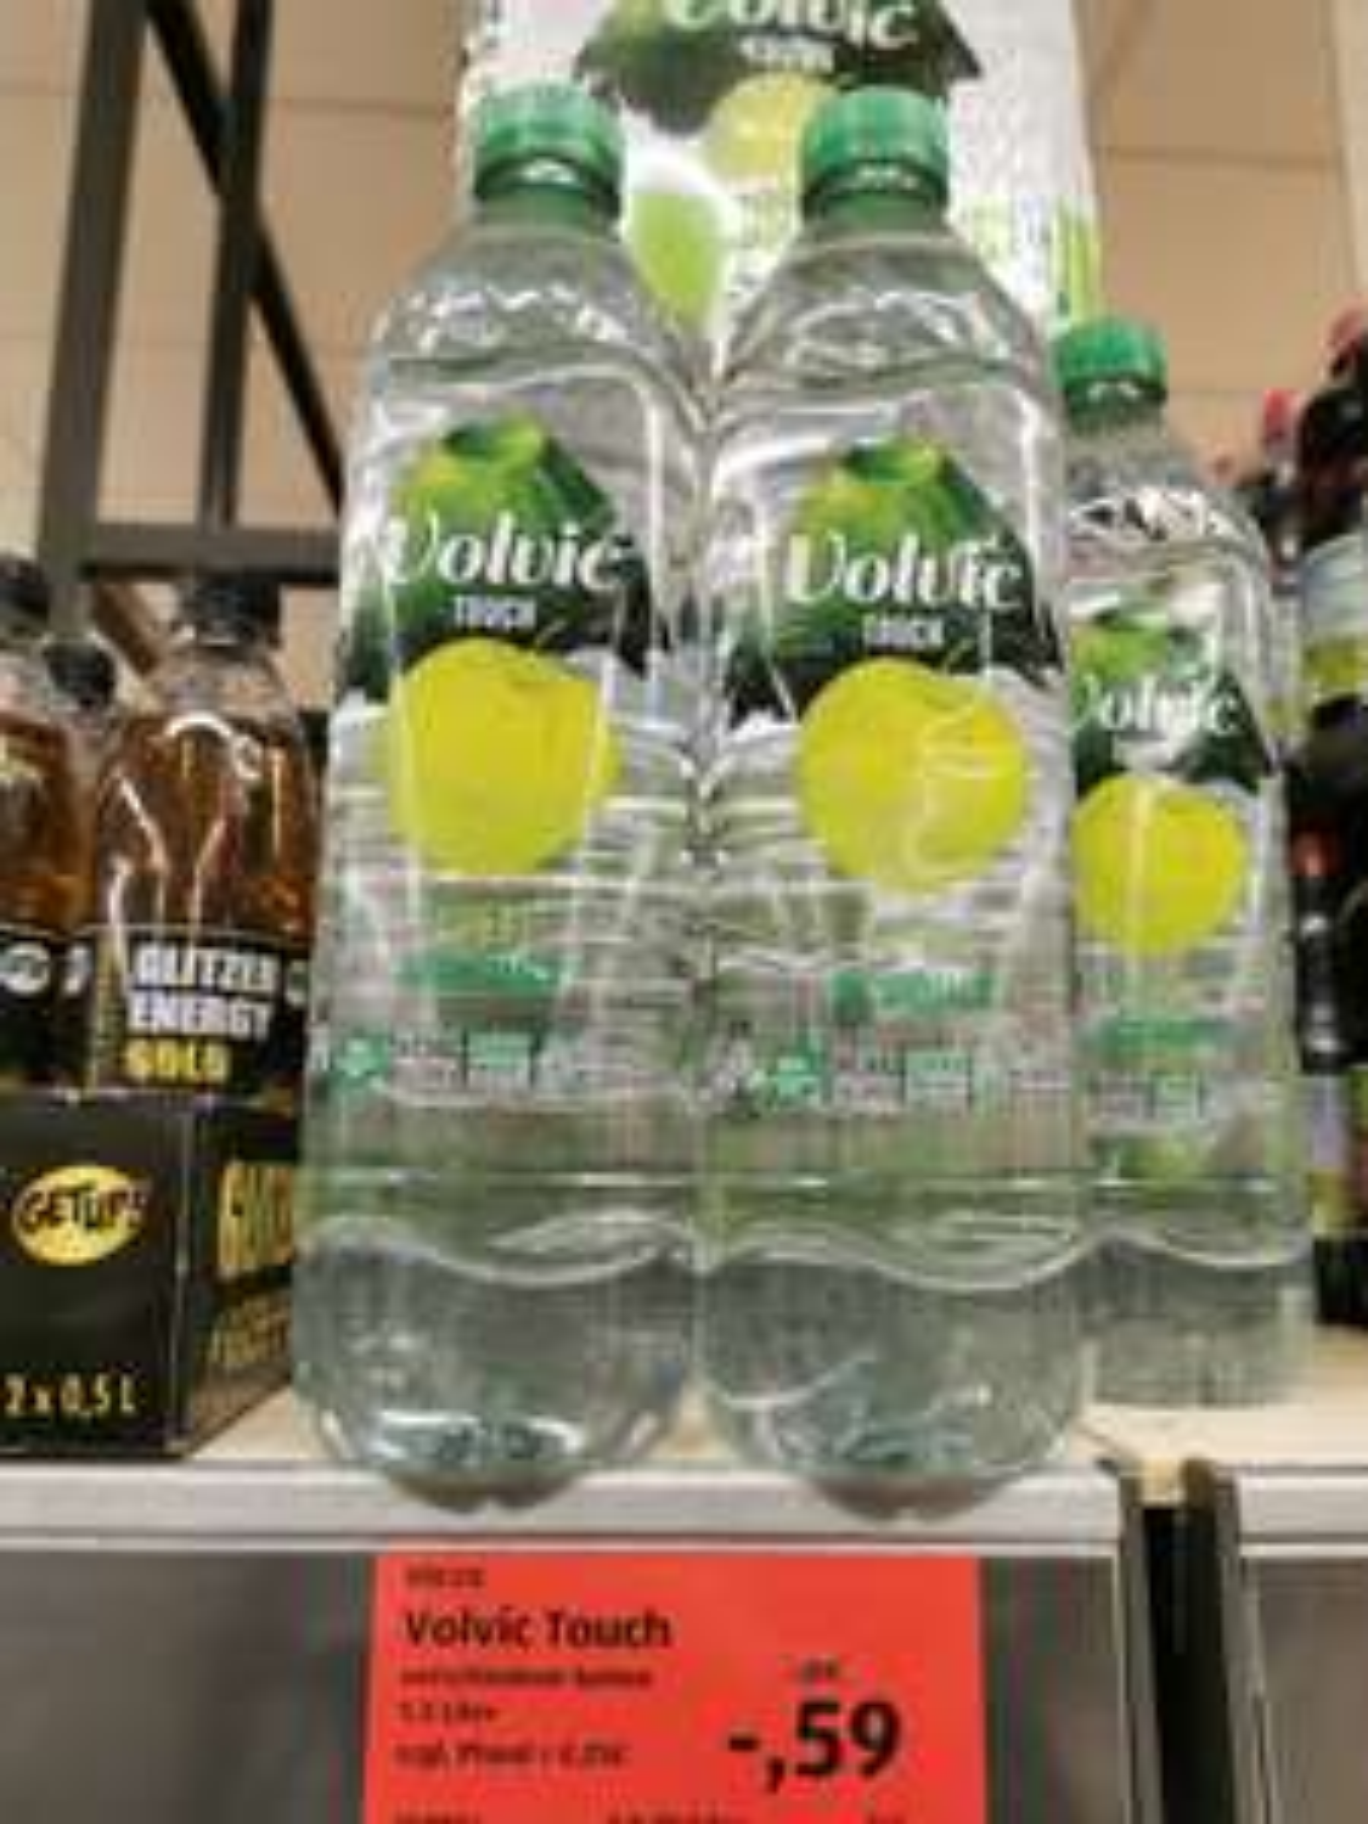 Volvic Touch 1,5 L Flasche Sorte Apfel *Lokal Düsseldorf Aldi Süd